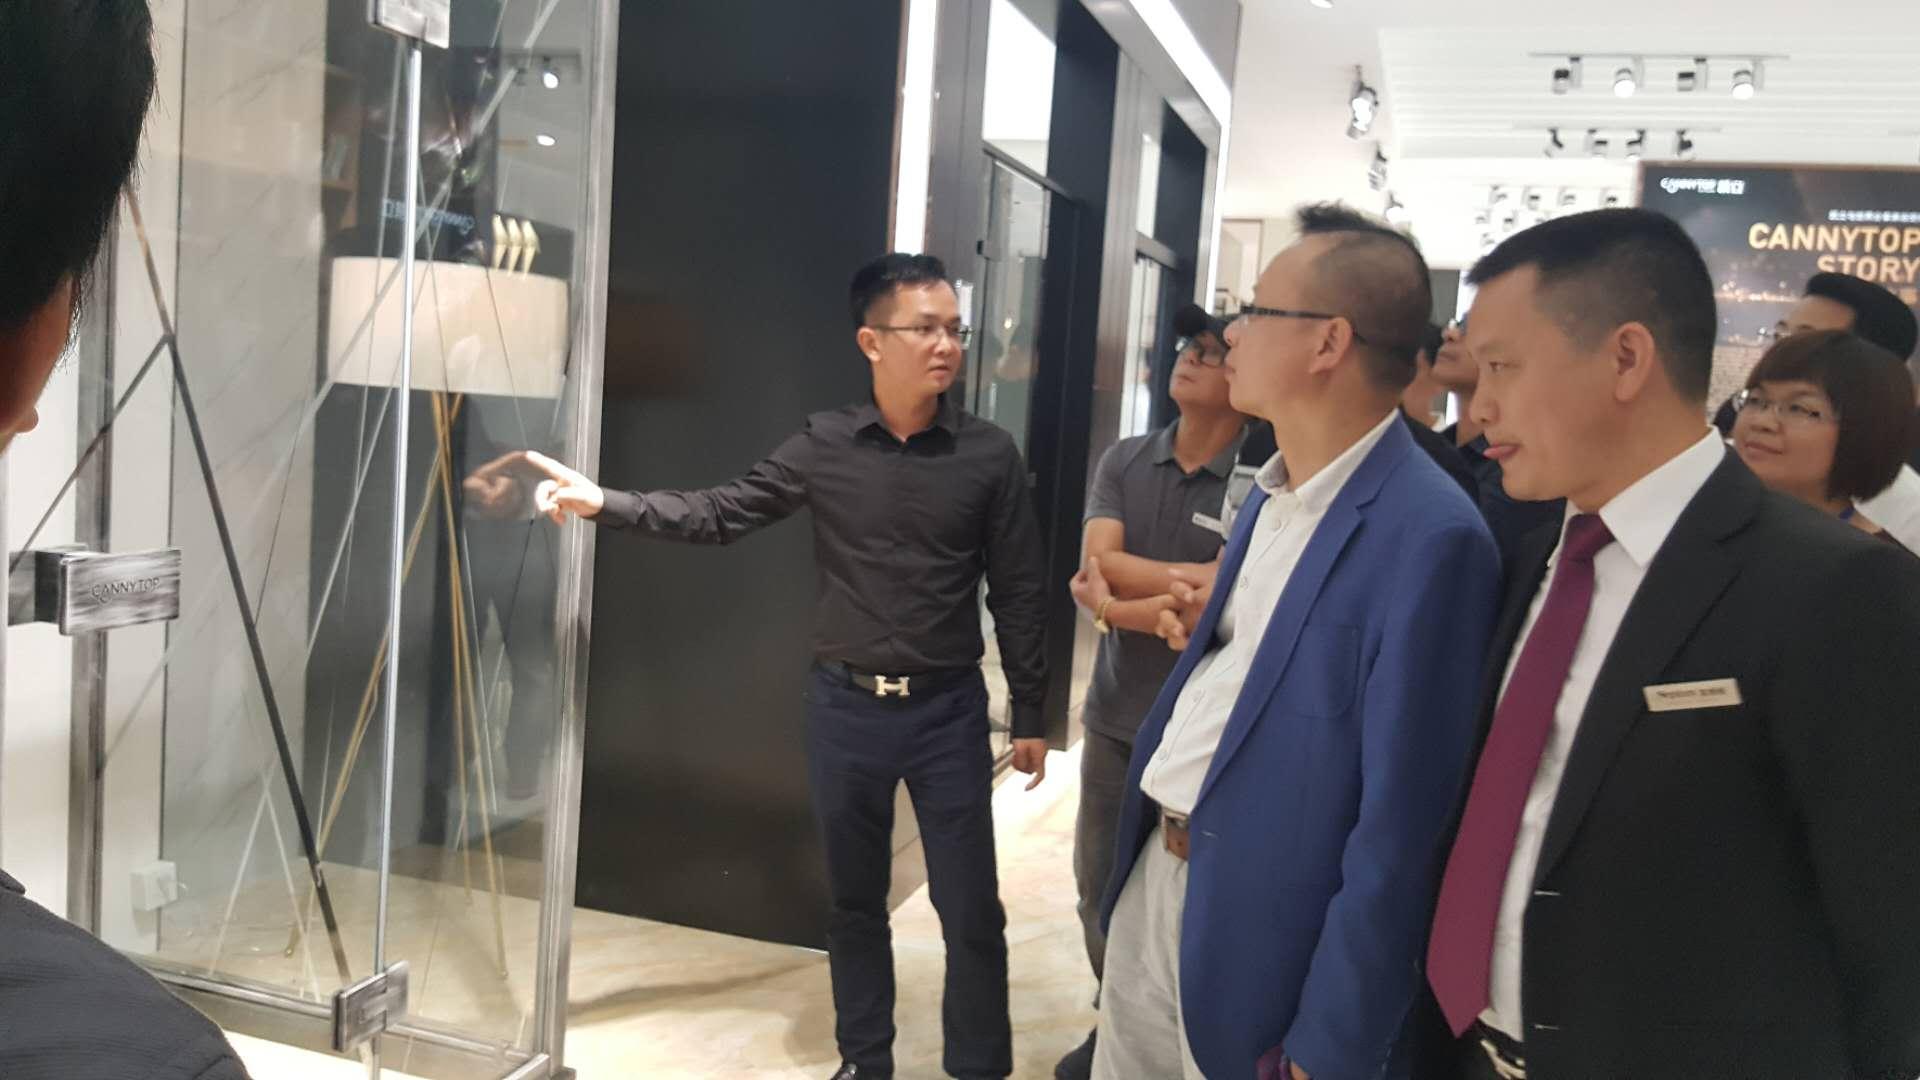 CANNYTOP凯立淋浴房2018上海国际厨卫展完美落幕